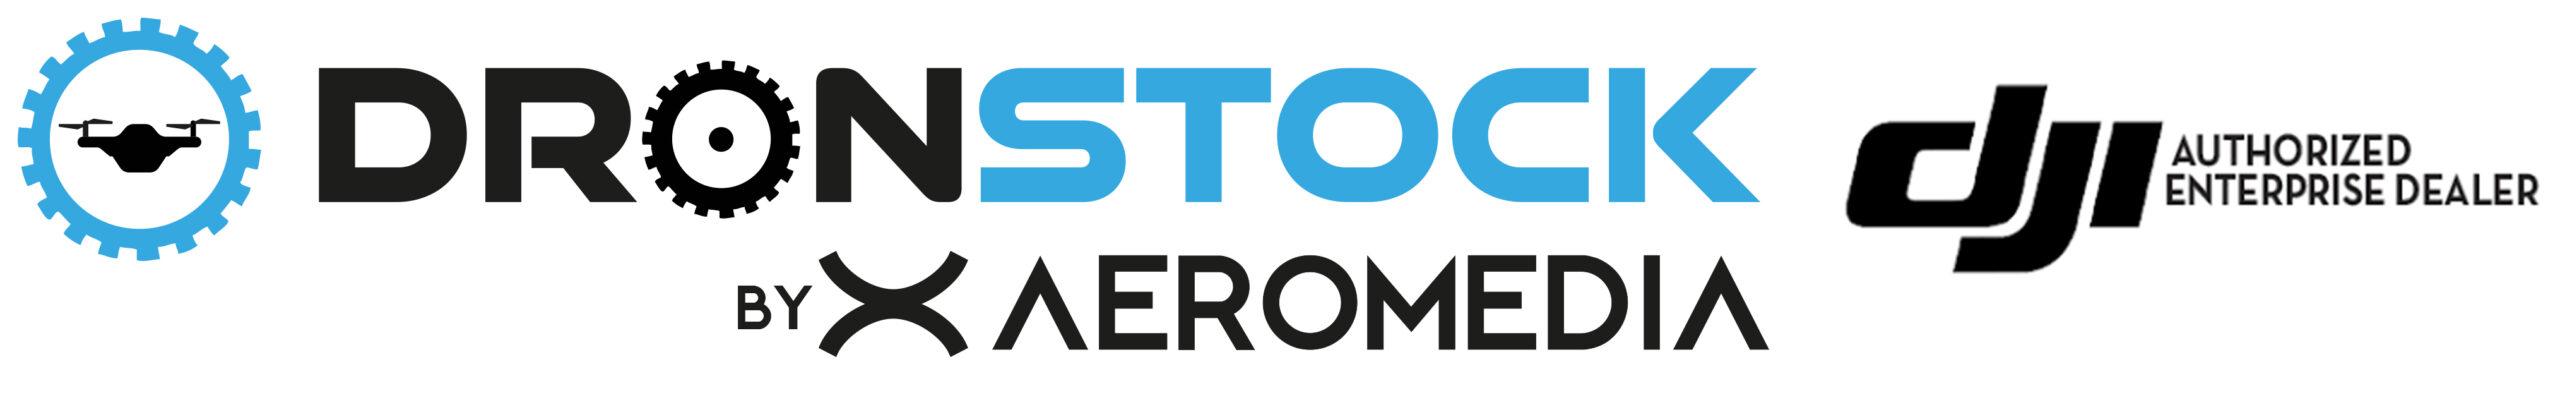 DronStock